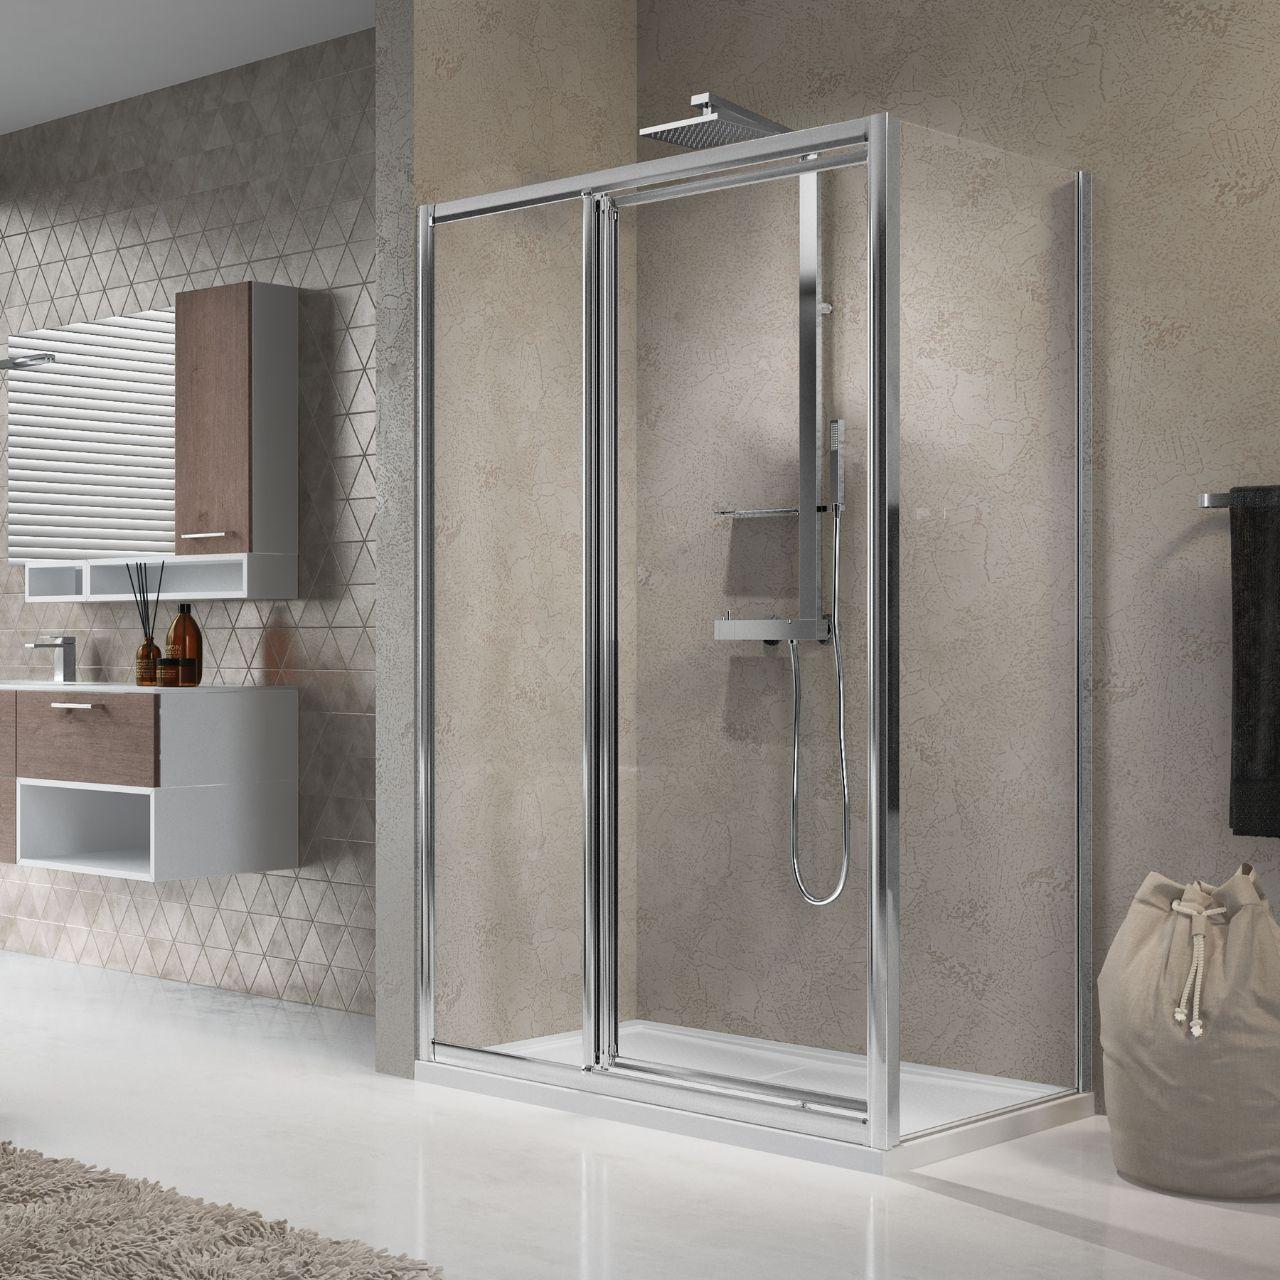 box doccia lunes g f in linea f novellini. Black Bedroom Furniture Sets. Home Design Ideas